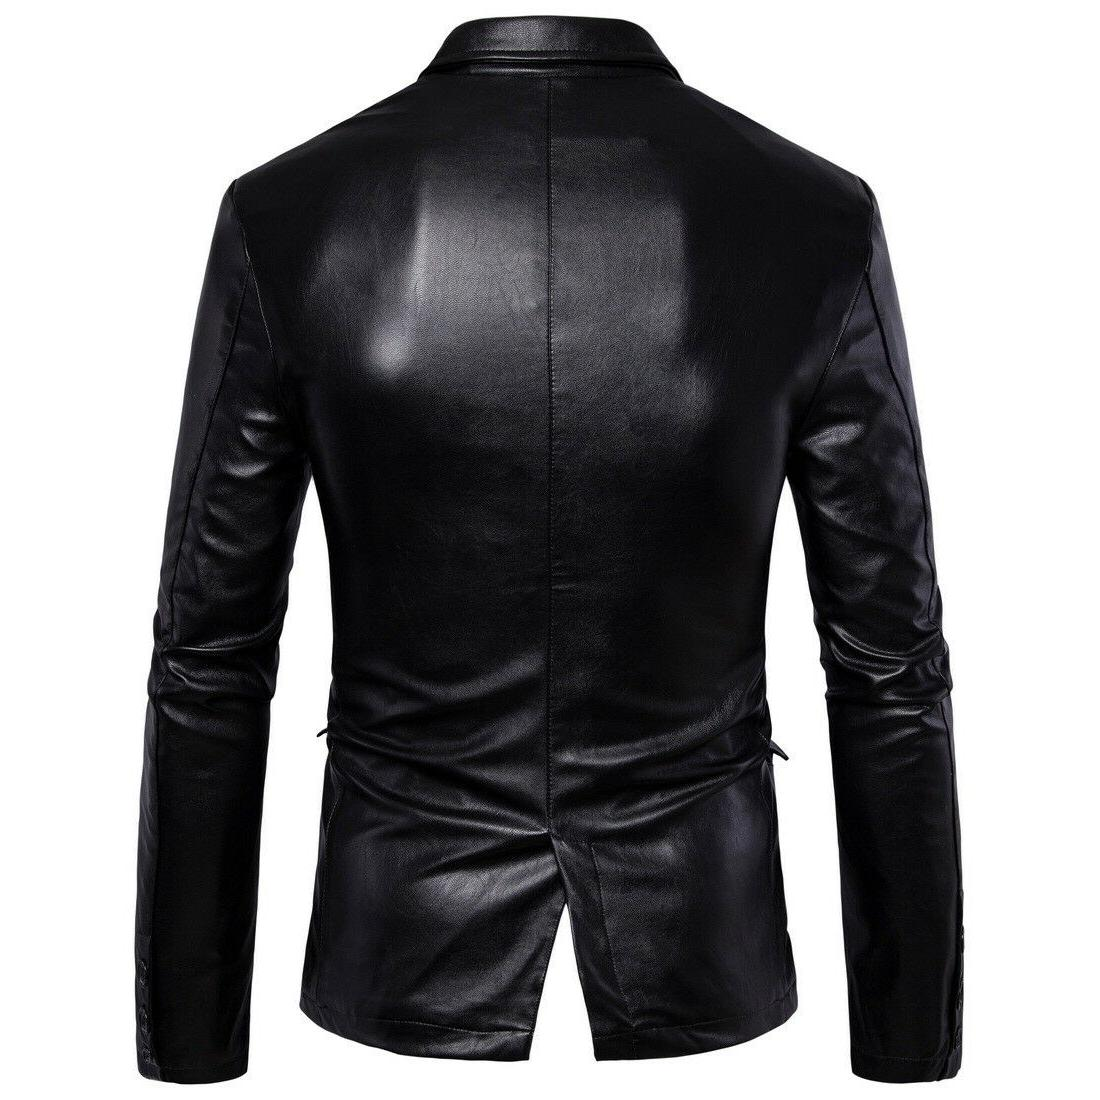 Hot Fall Men's Leather Back Slit Top